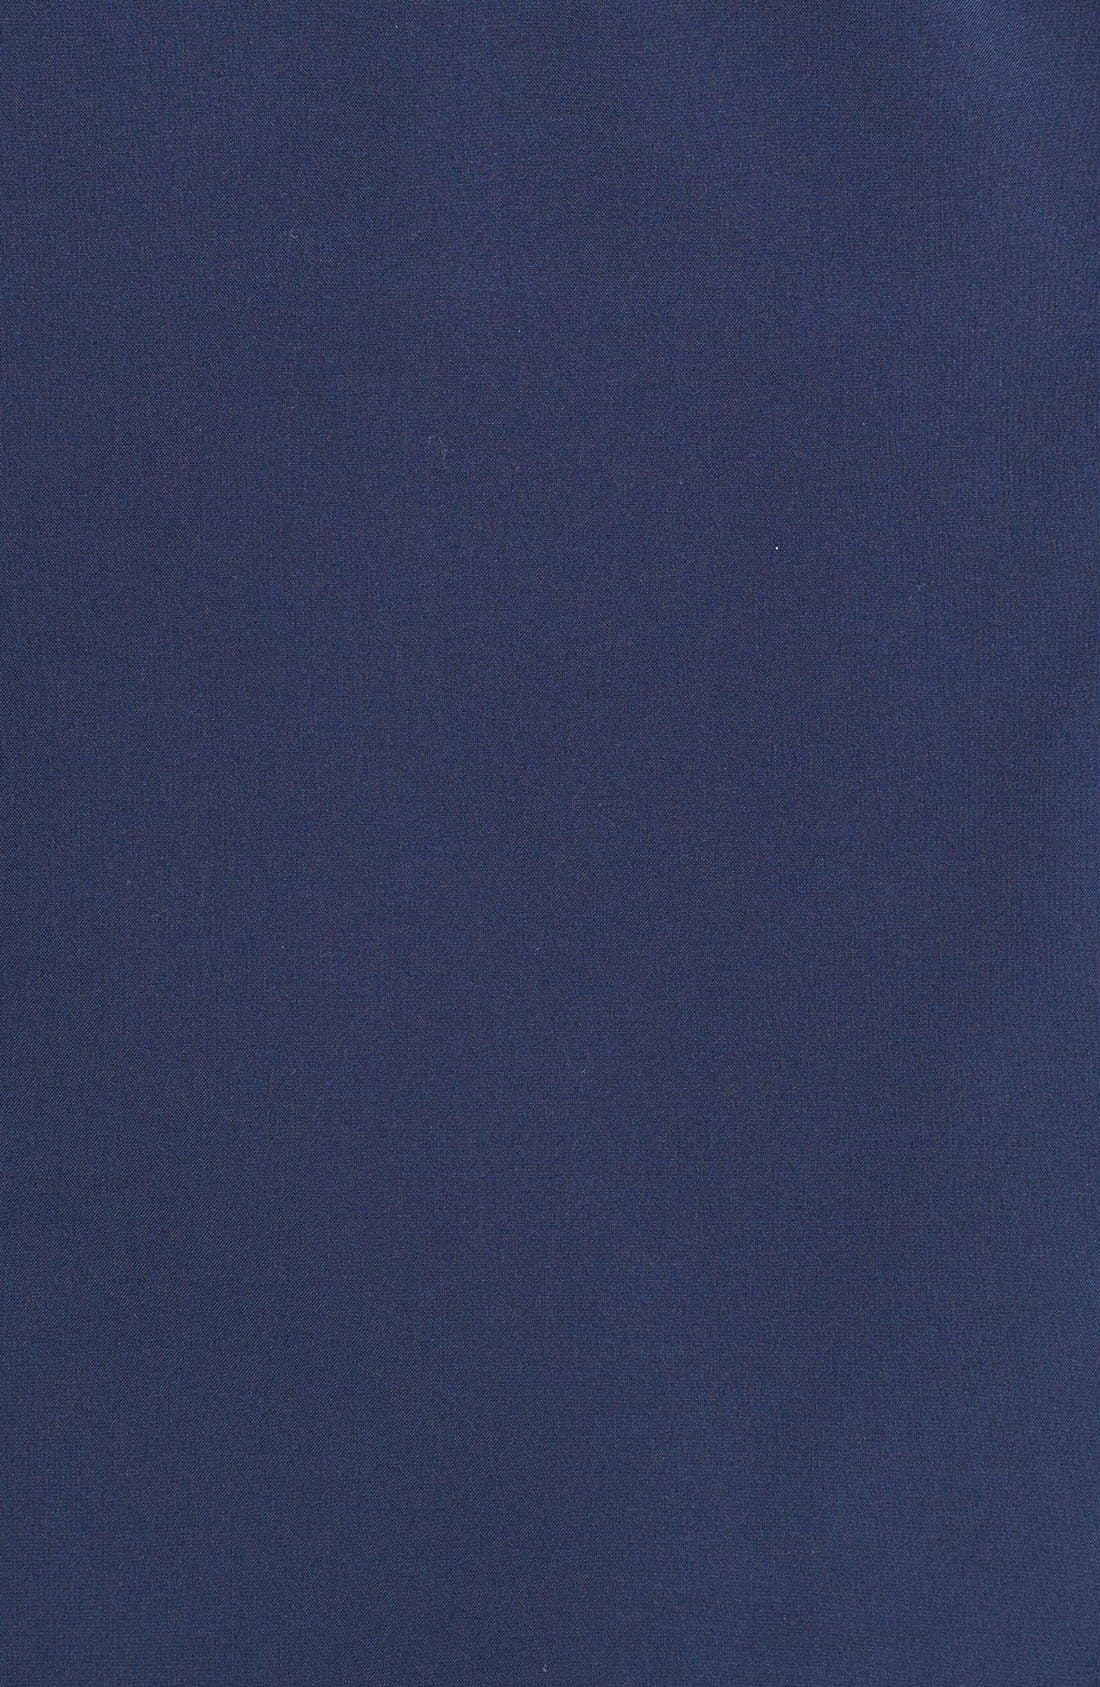 Alternate Image 3  - The North Face 'Apex Bionic Grace' Jacket